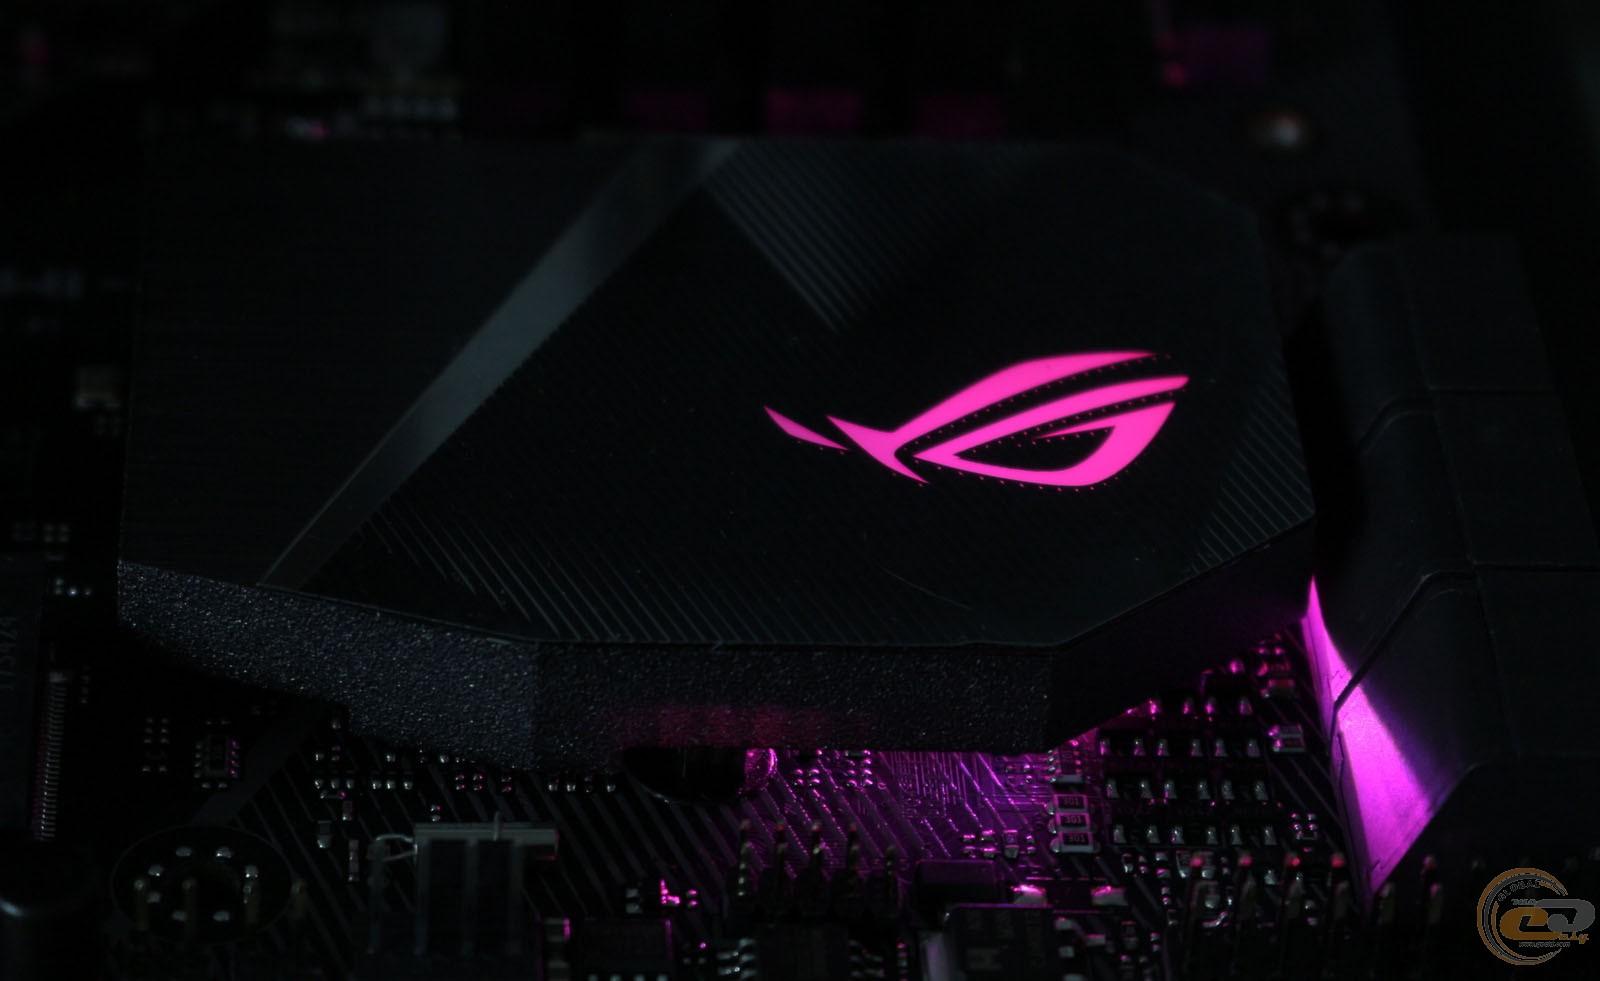 ROG STRIX Z370-G GAMING подсветка